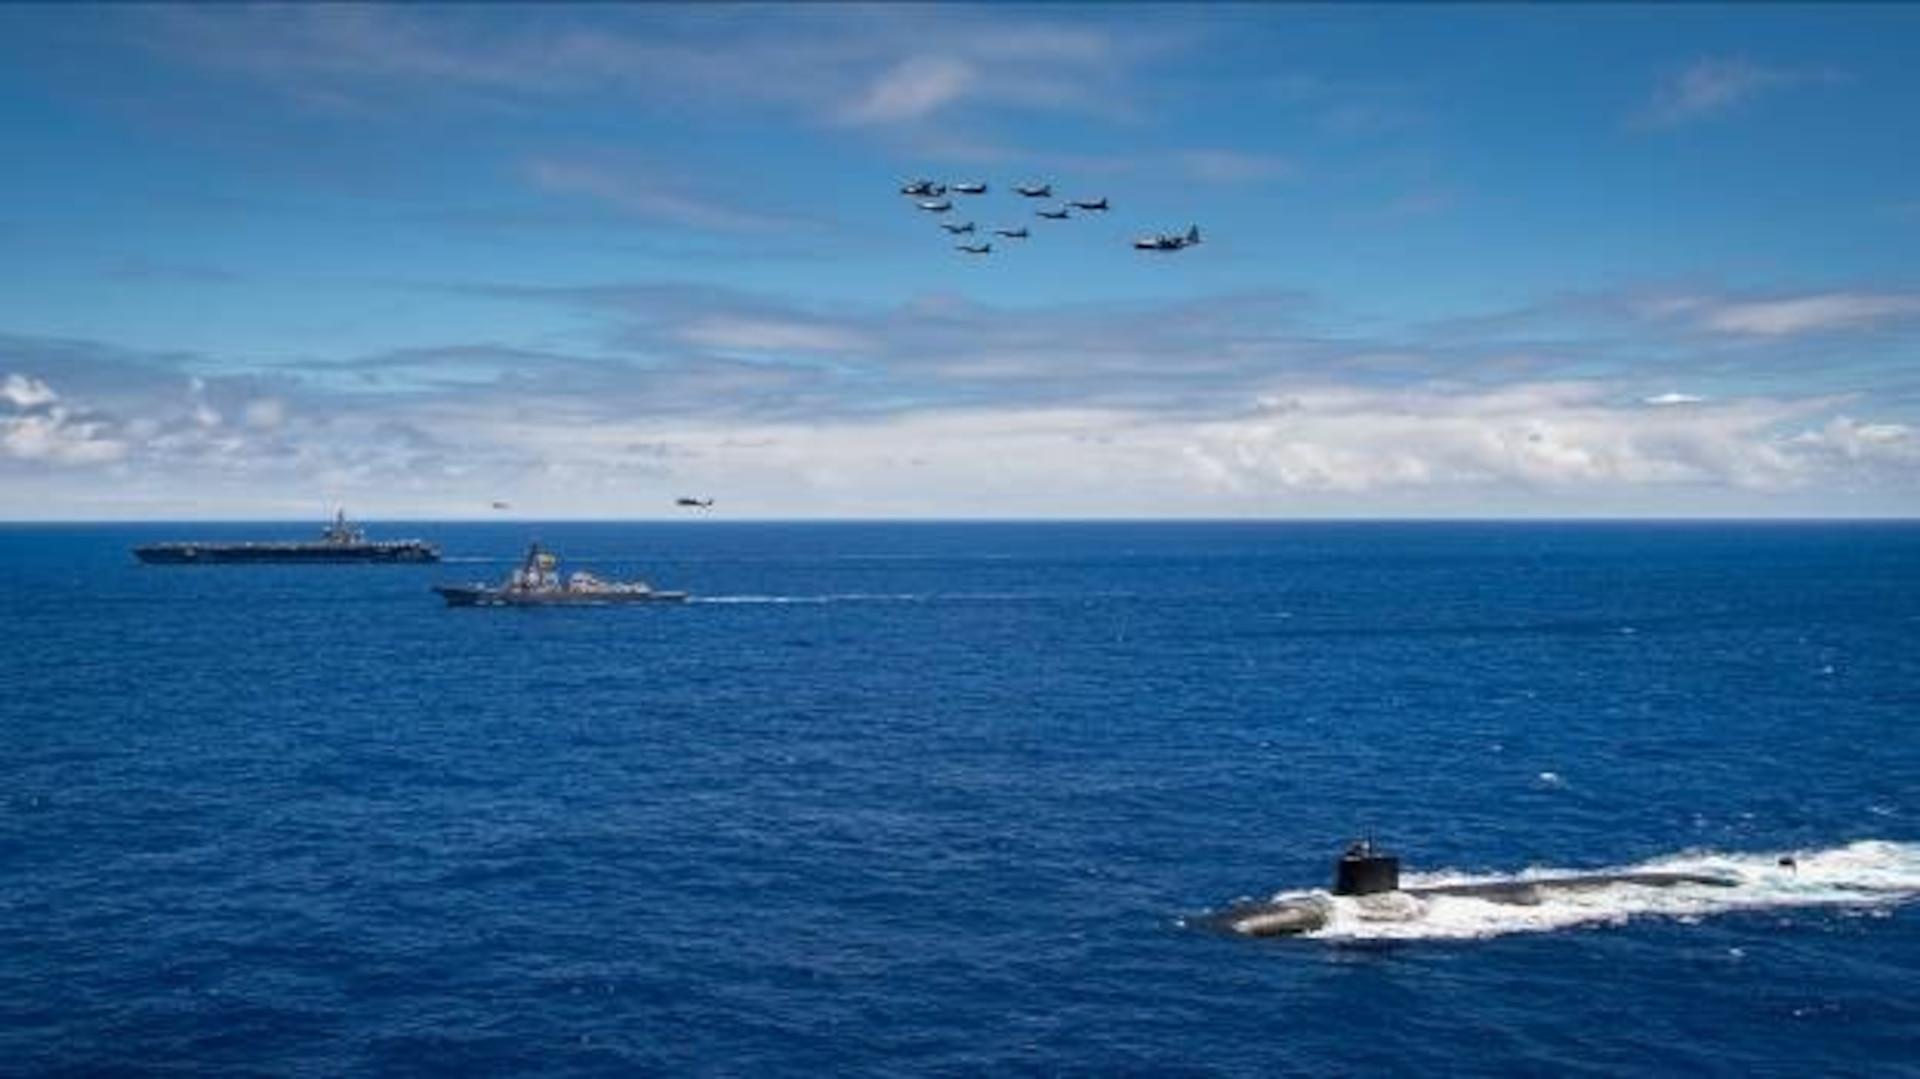 U.S. Navy, Marines, Coast Guard Conduct Joint Operations